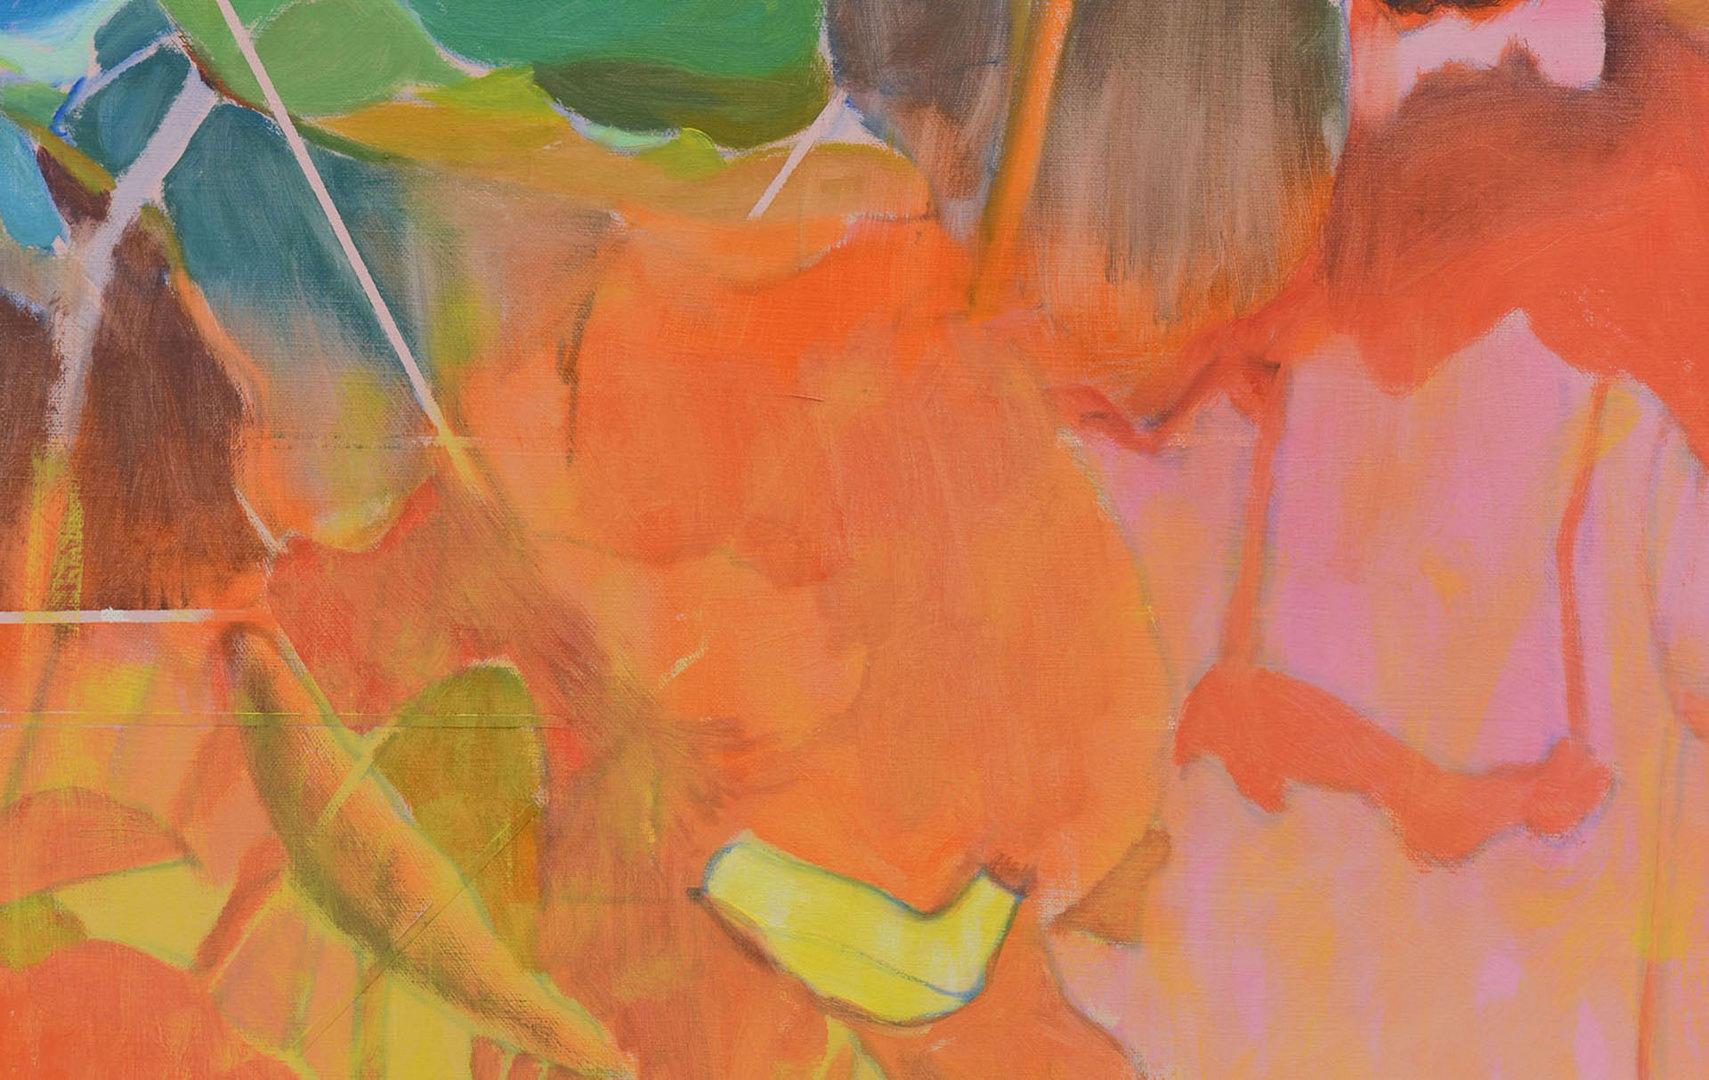 Lot 360: Mizue Sawano, abstract floral painting